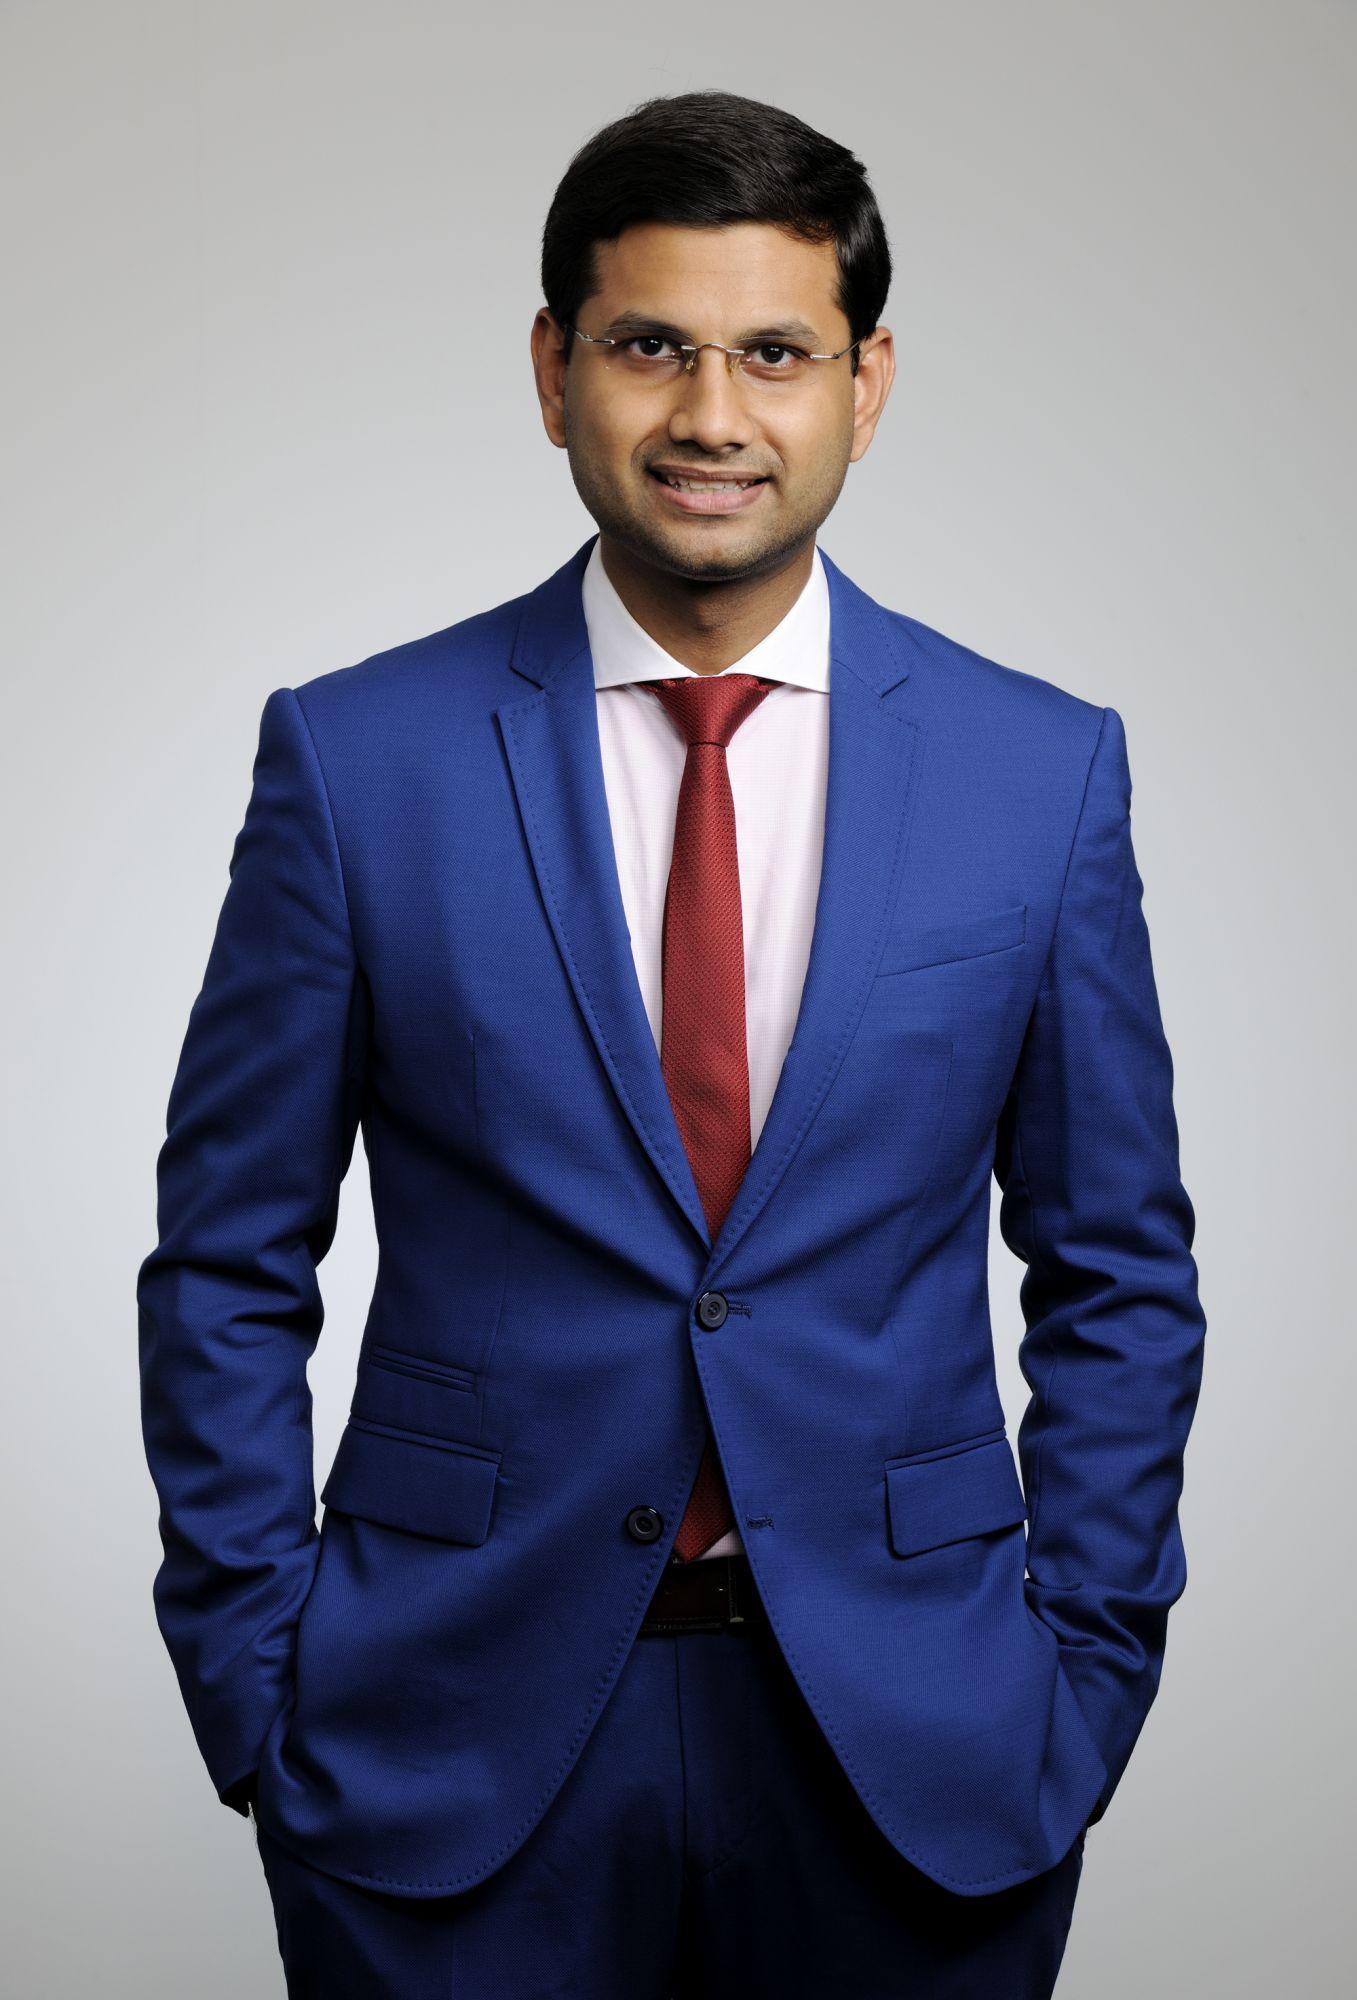 Abbas Ali Mohamed Irshad